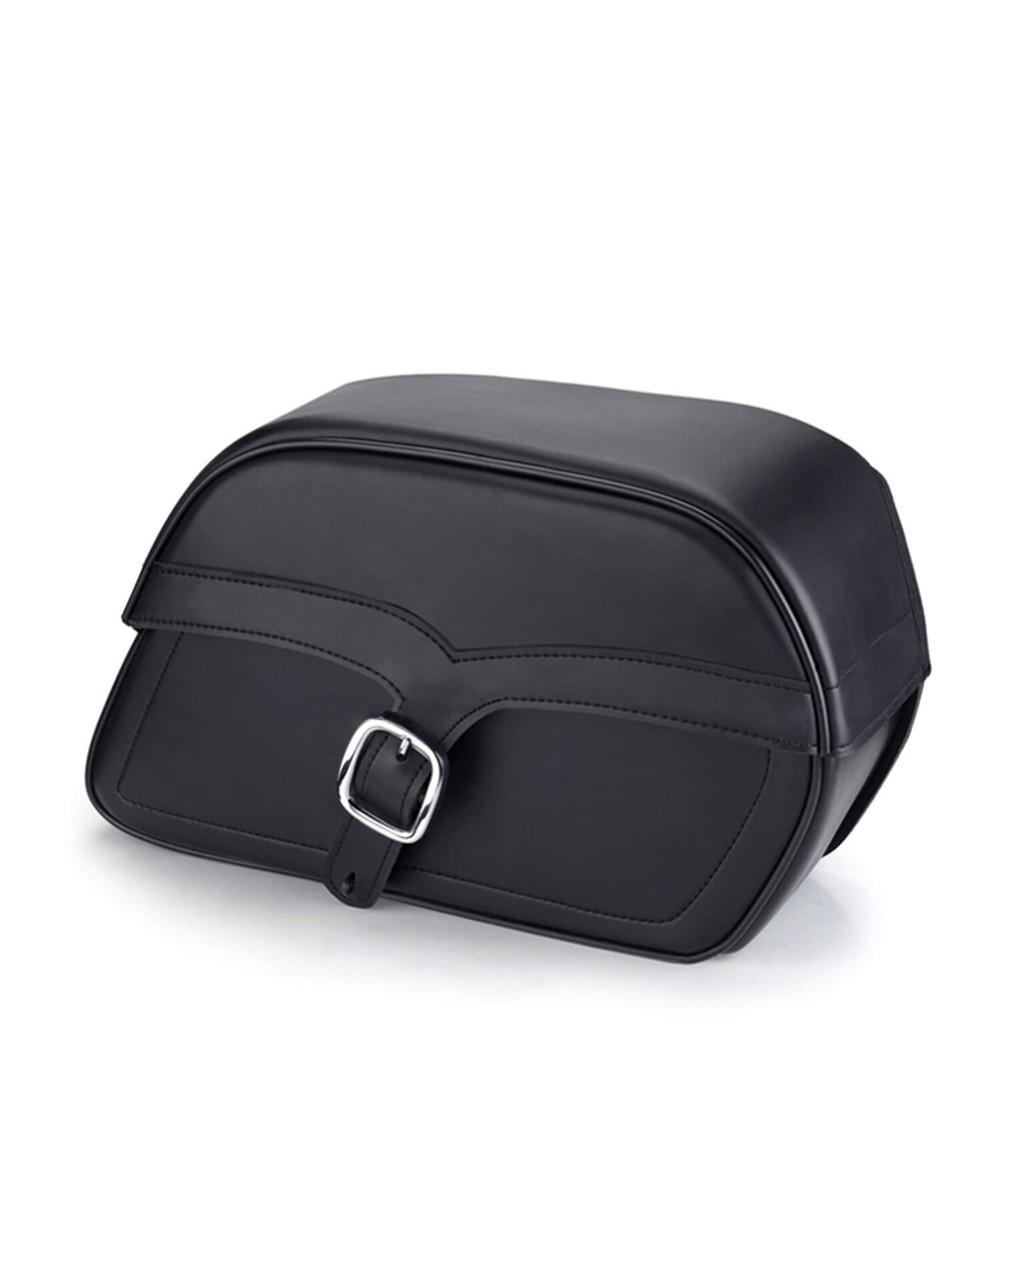 Honda 1100 Shadow Aero SS Slant Medium Motorcycle Saddlebags Main Bag View